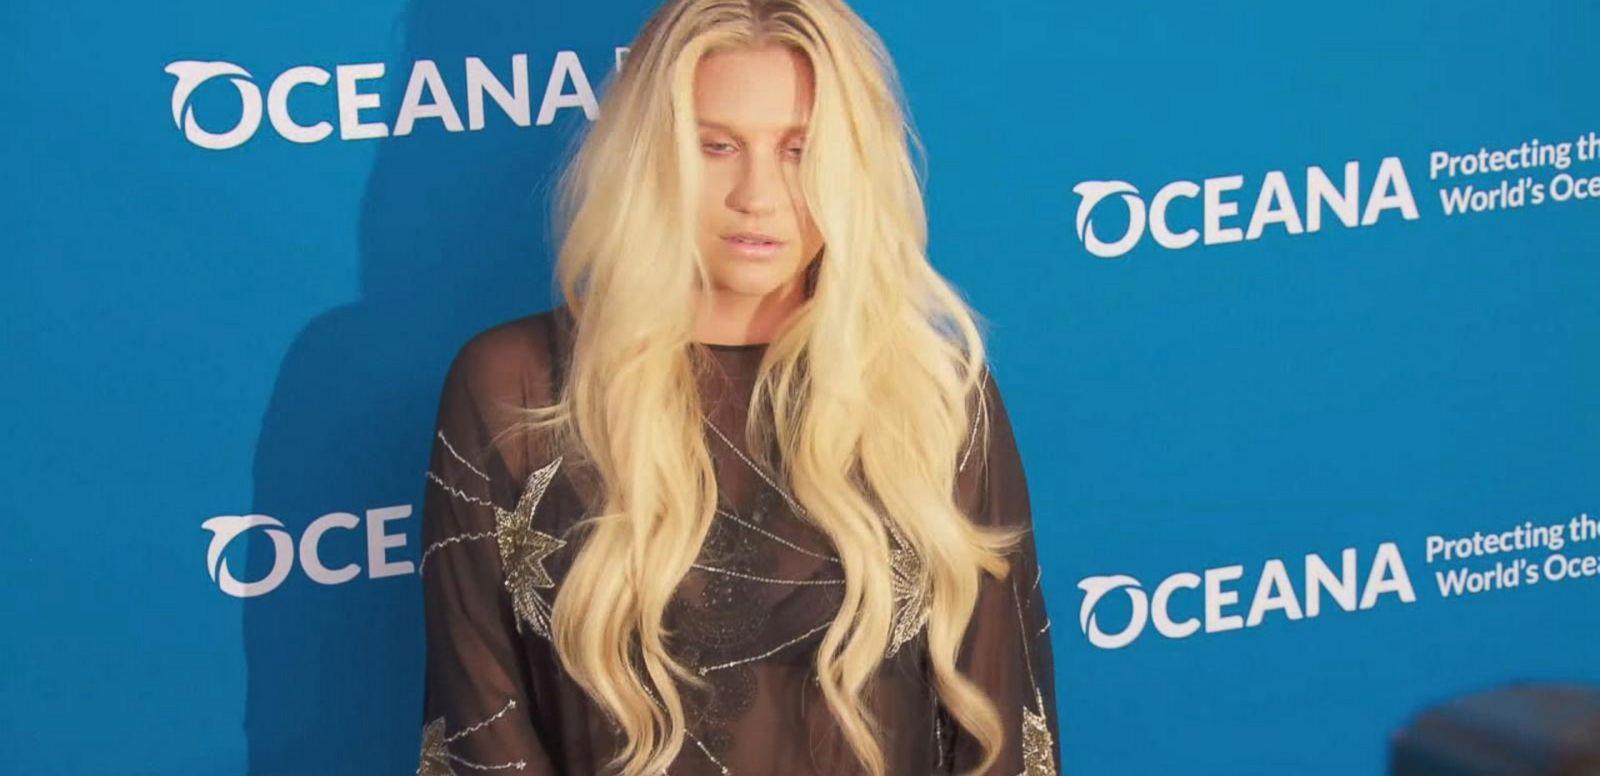 VIDEO: Stars, Fans Voice Support for Kesha After Judges Ruling